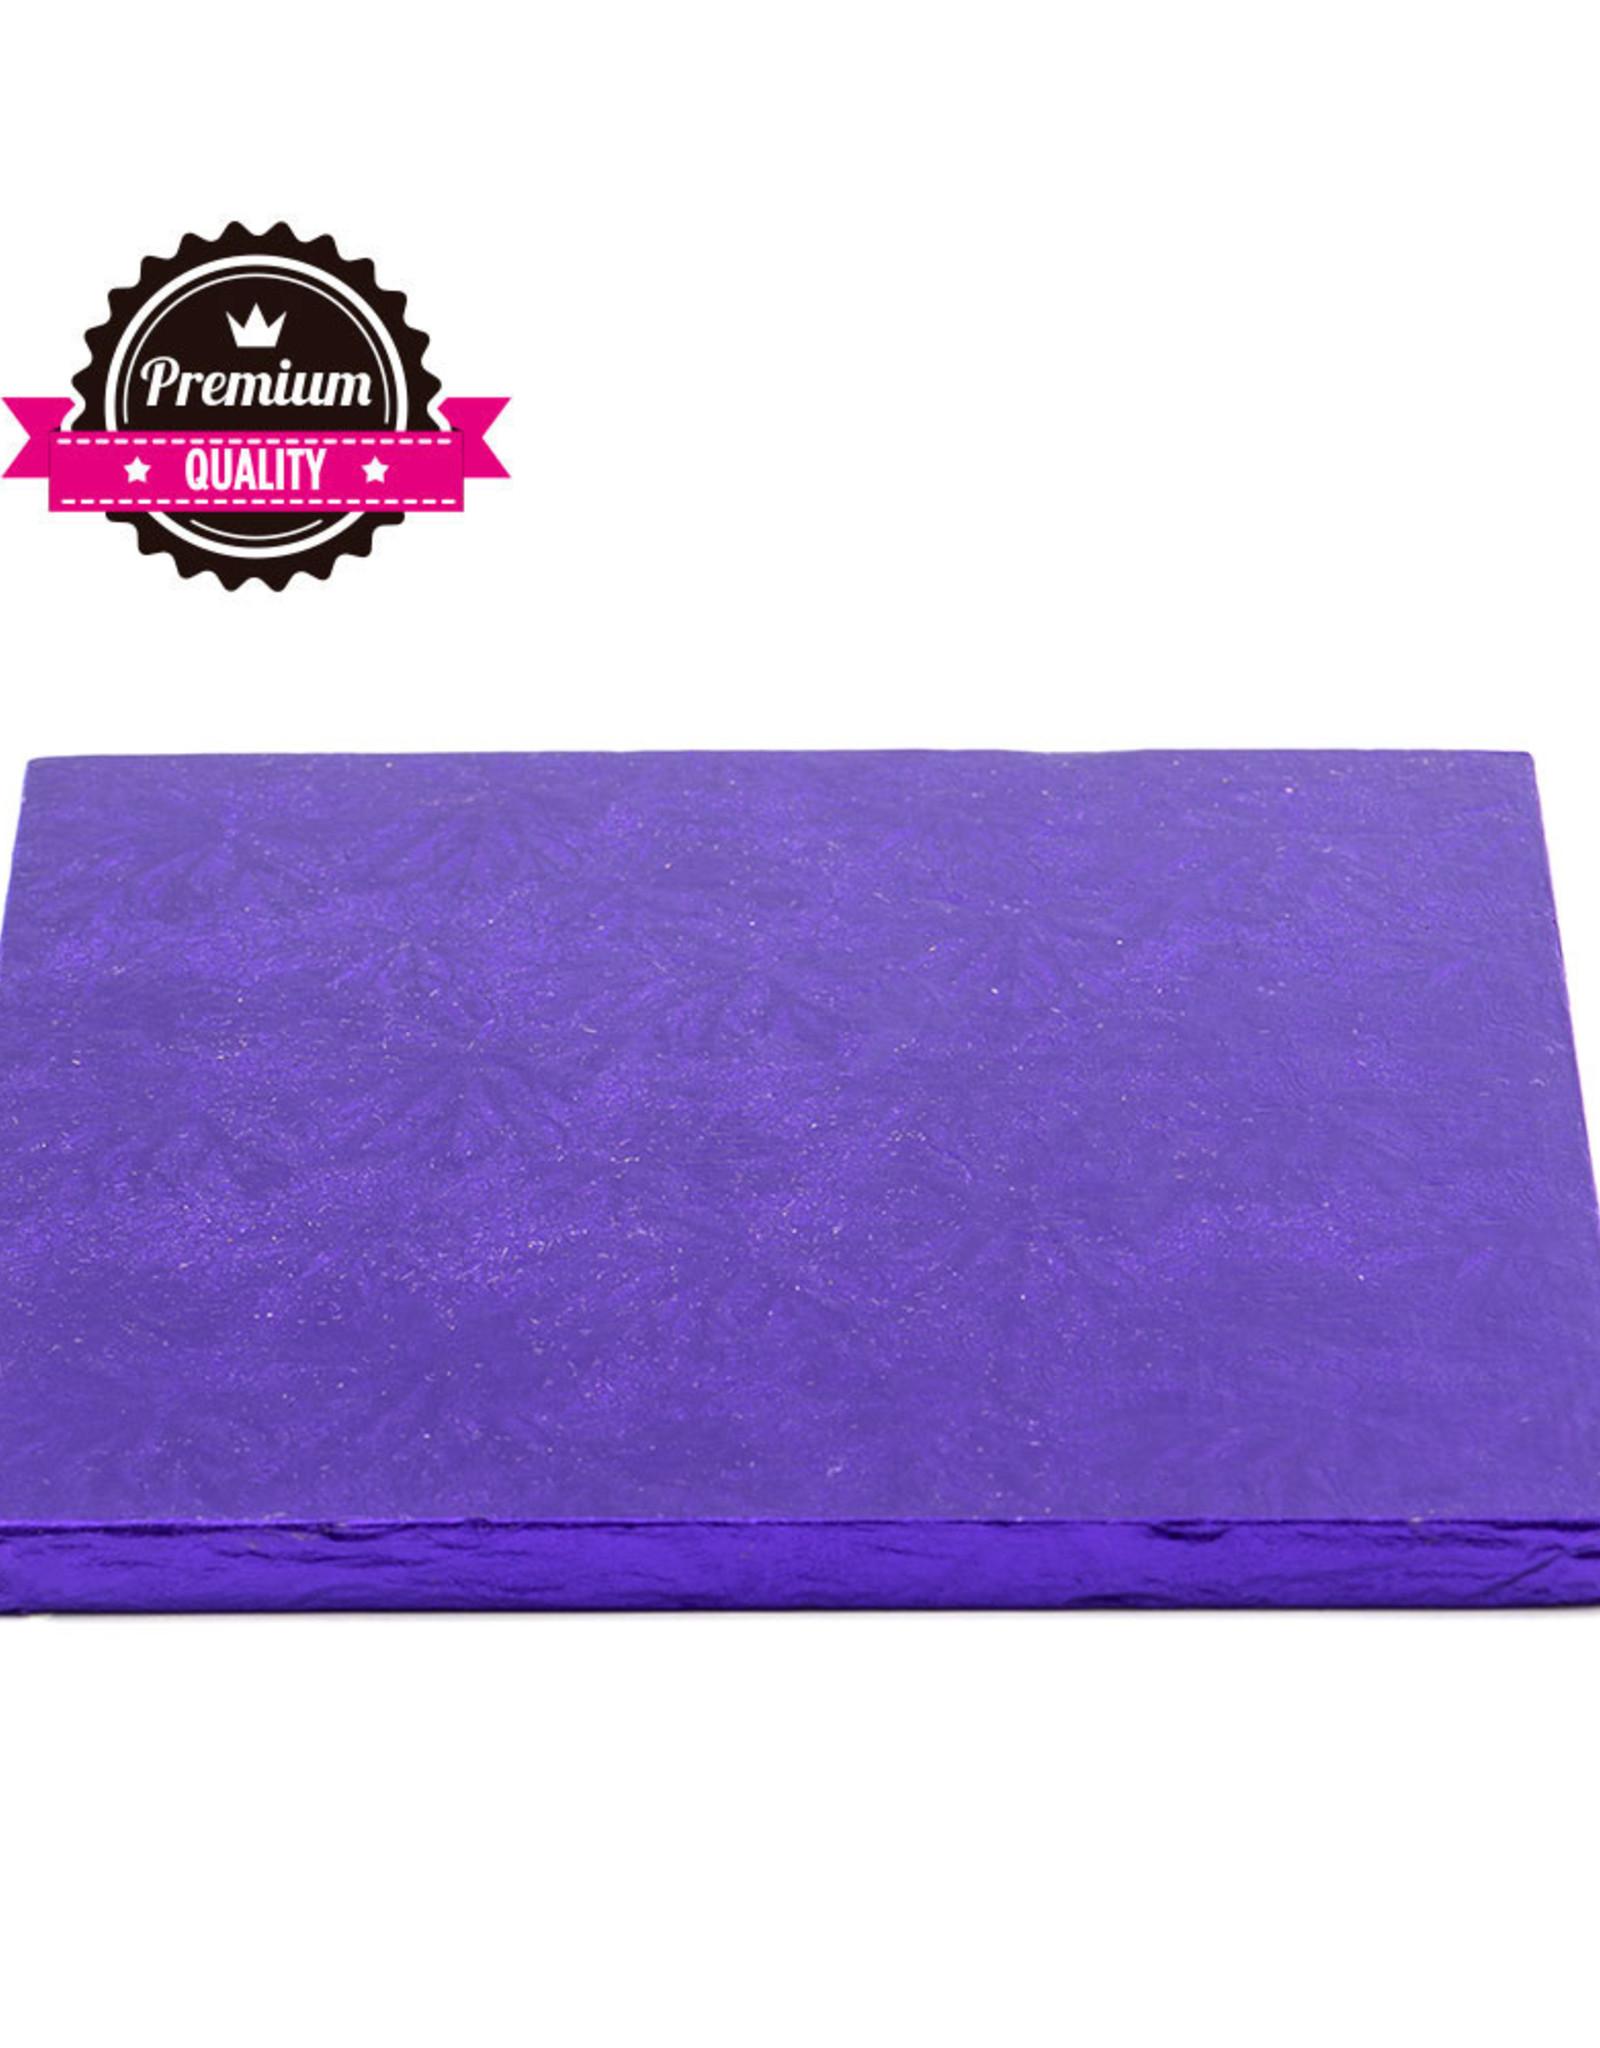 Decora Cake Drum Vierkant 40cm Violet